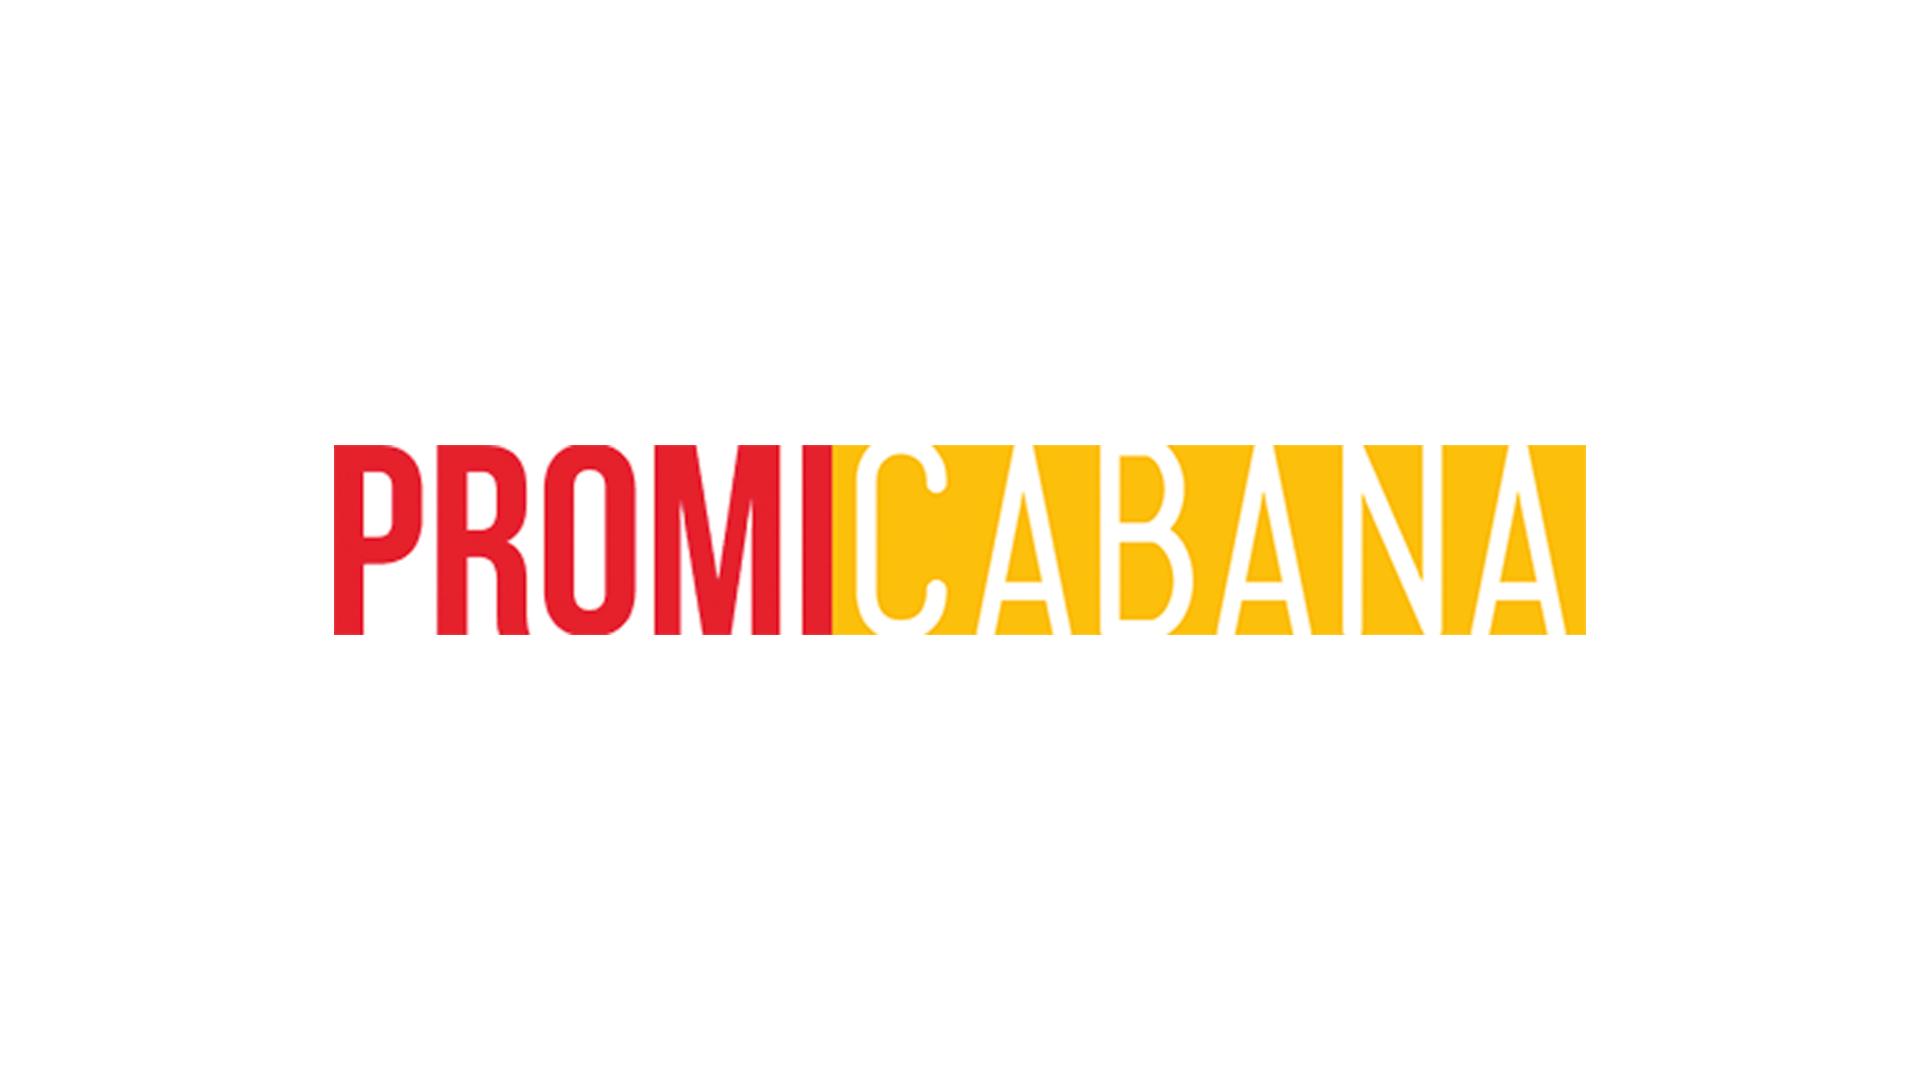 Billy-Ray-Cyrus-Miley-Cyrus-2009_slider